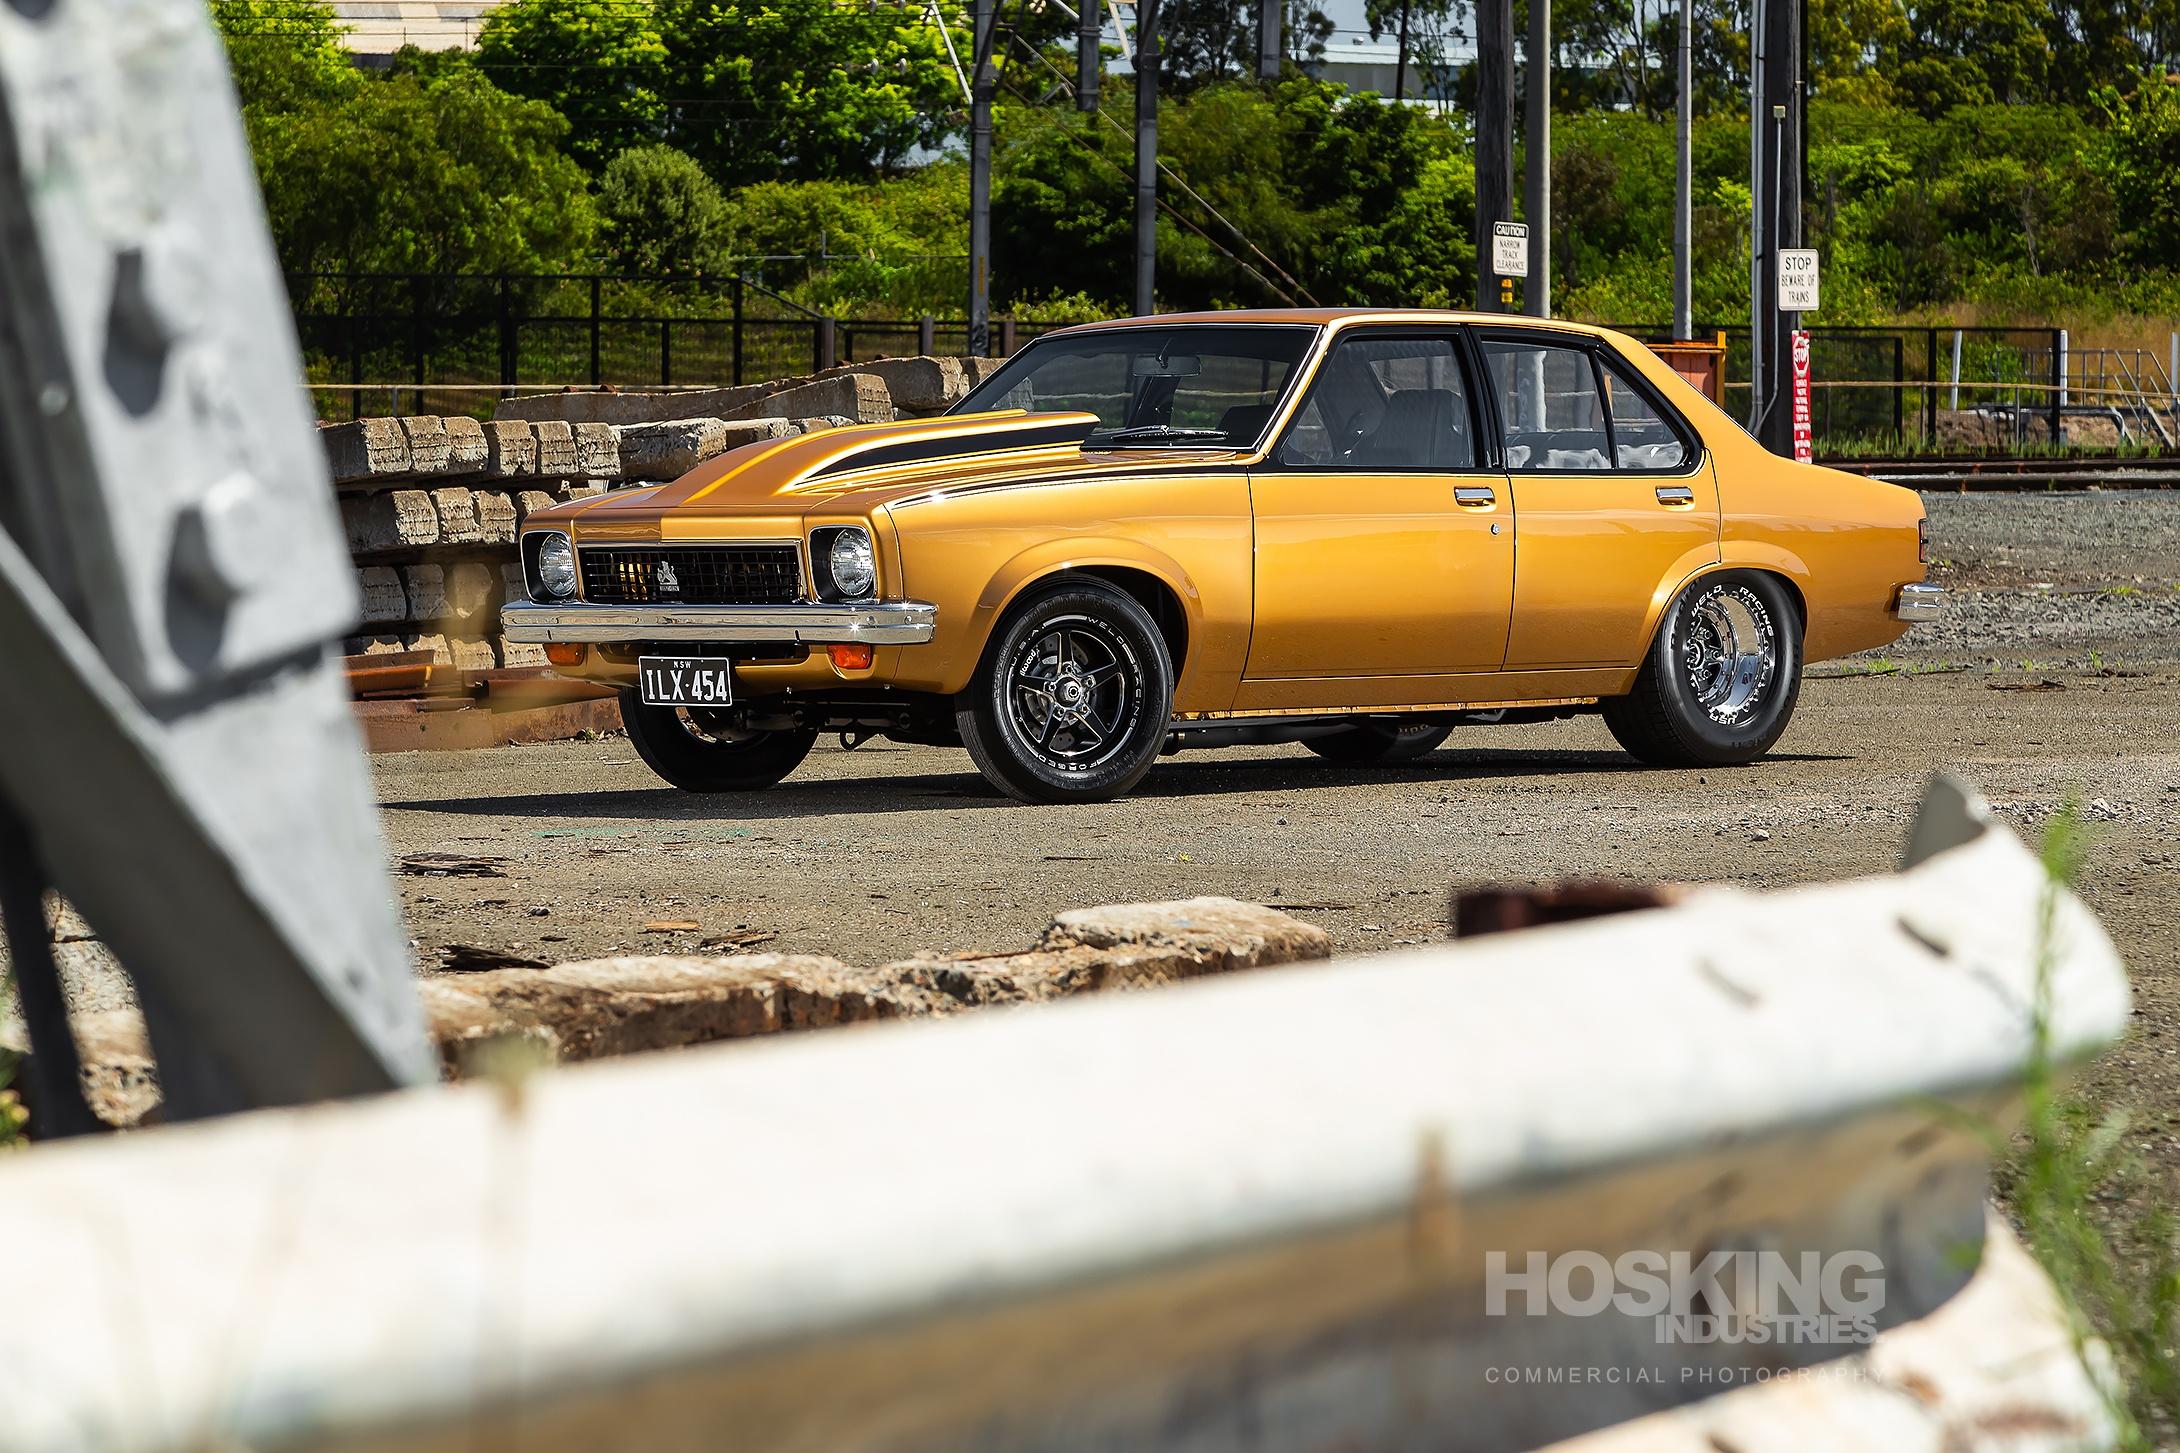 Mendo's gold Holden Torana